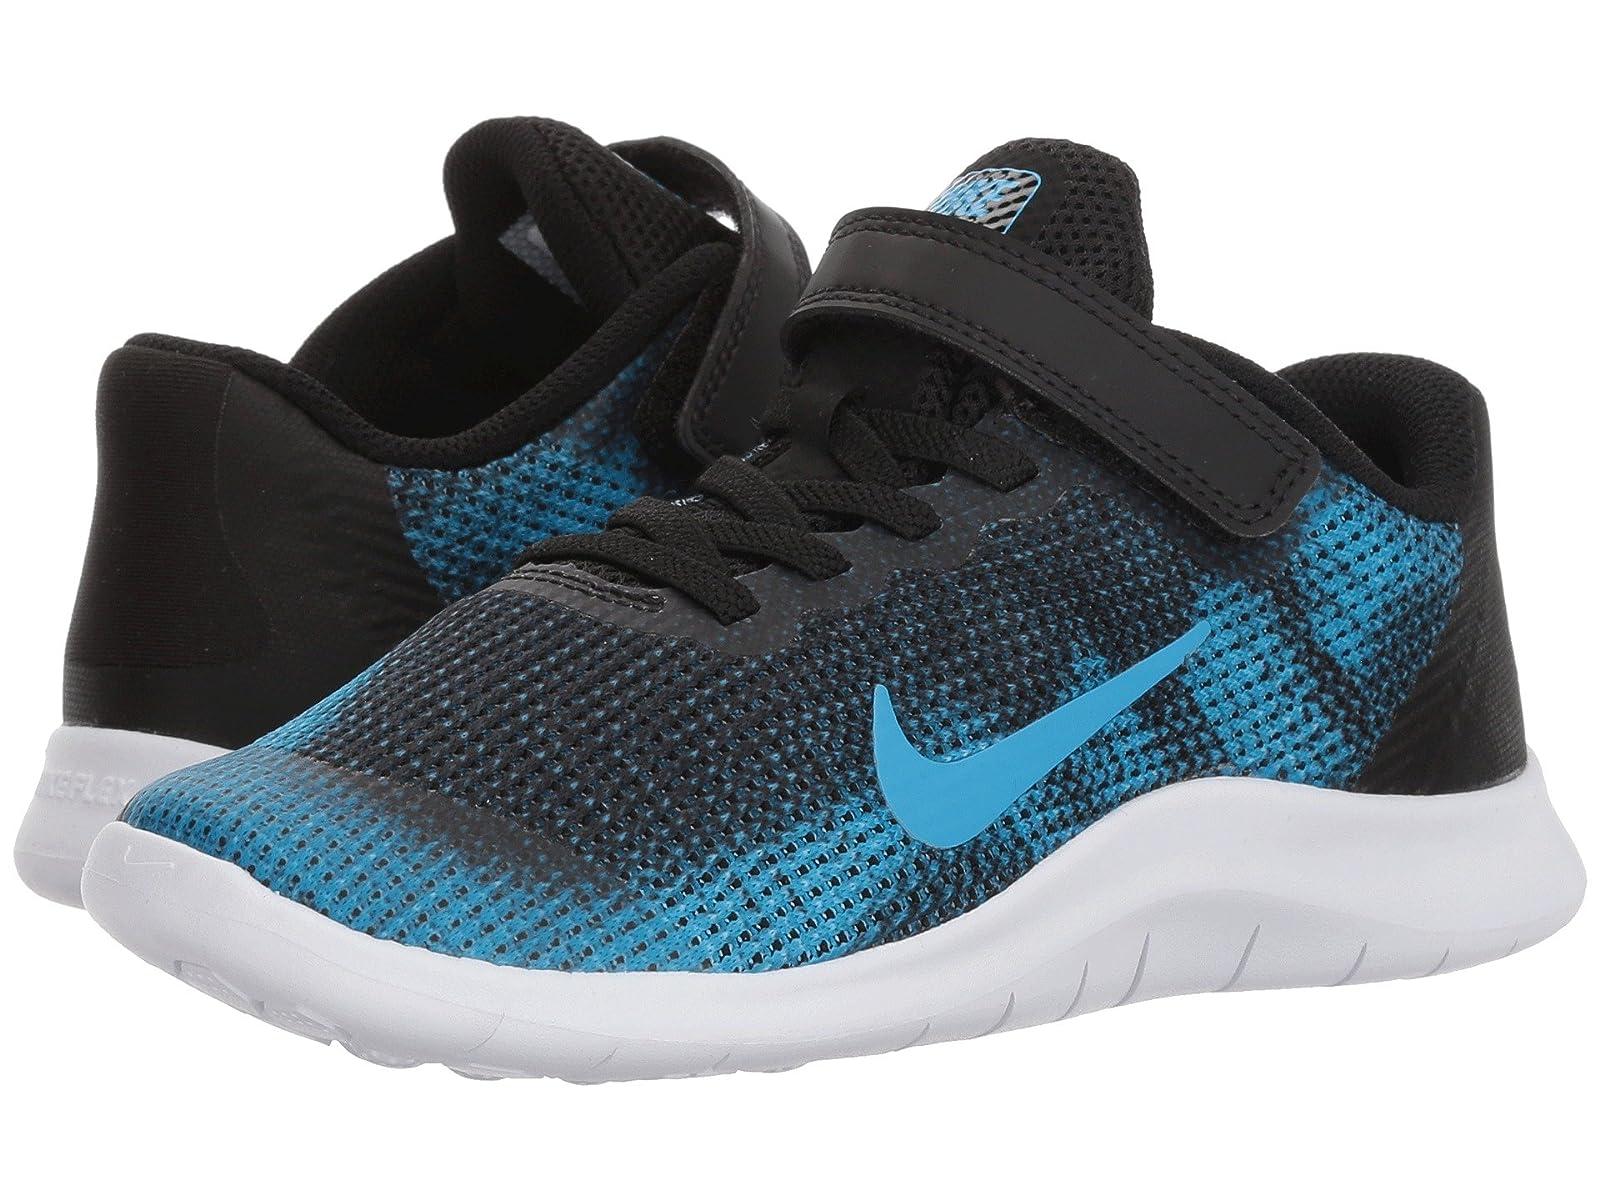 Nike Kids Flex Run 2018 (Little Kid)Atmospheric grades have affordable shoes